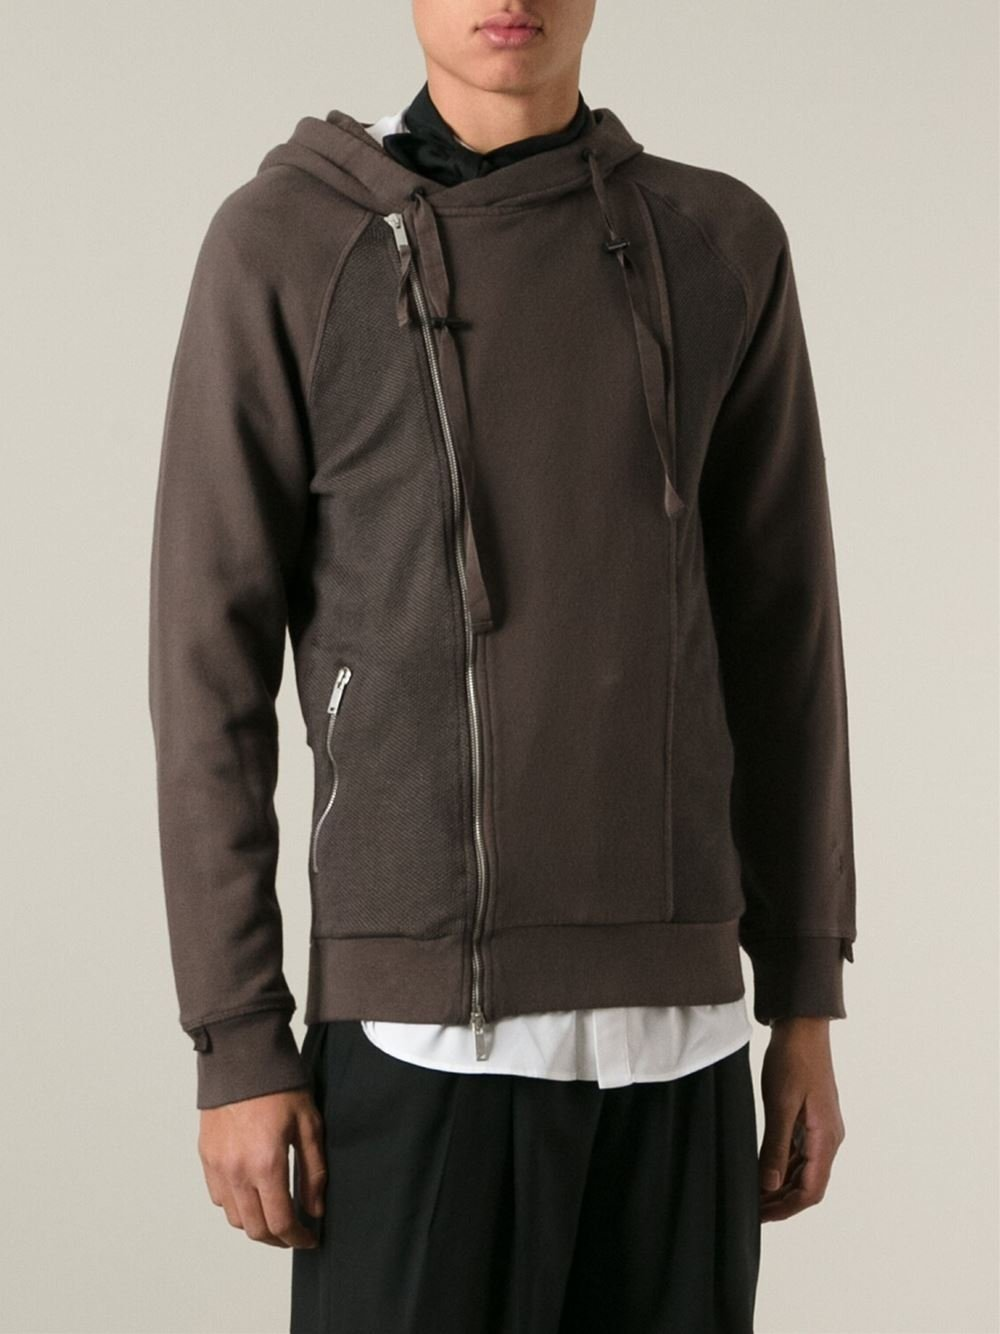 alexander mcqueen piqu panel hoodie in brown for men lyst. Black Bedroom Furniture Sets. Home Design Ideas